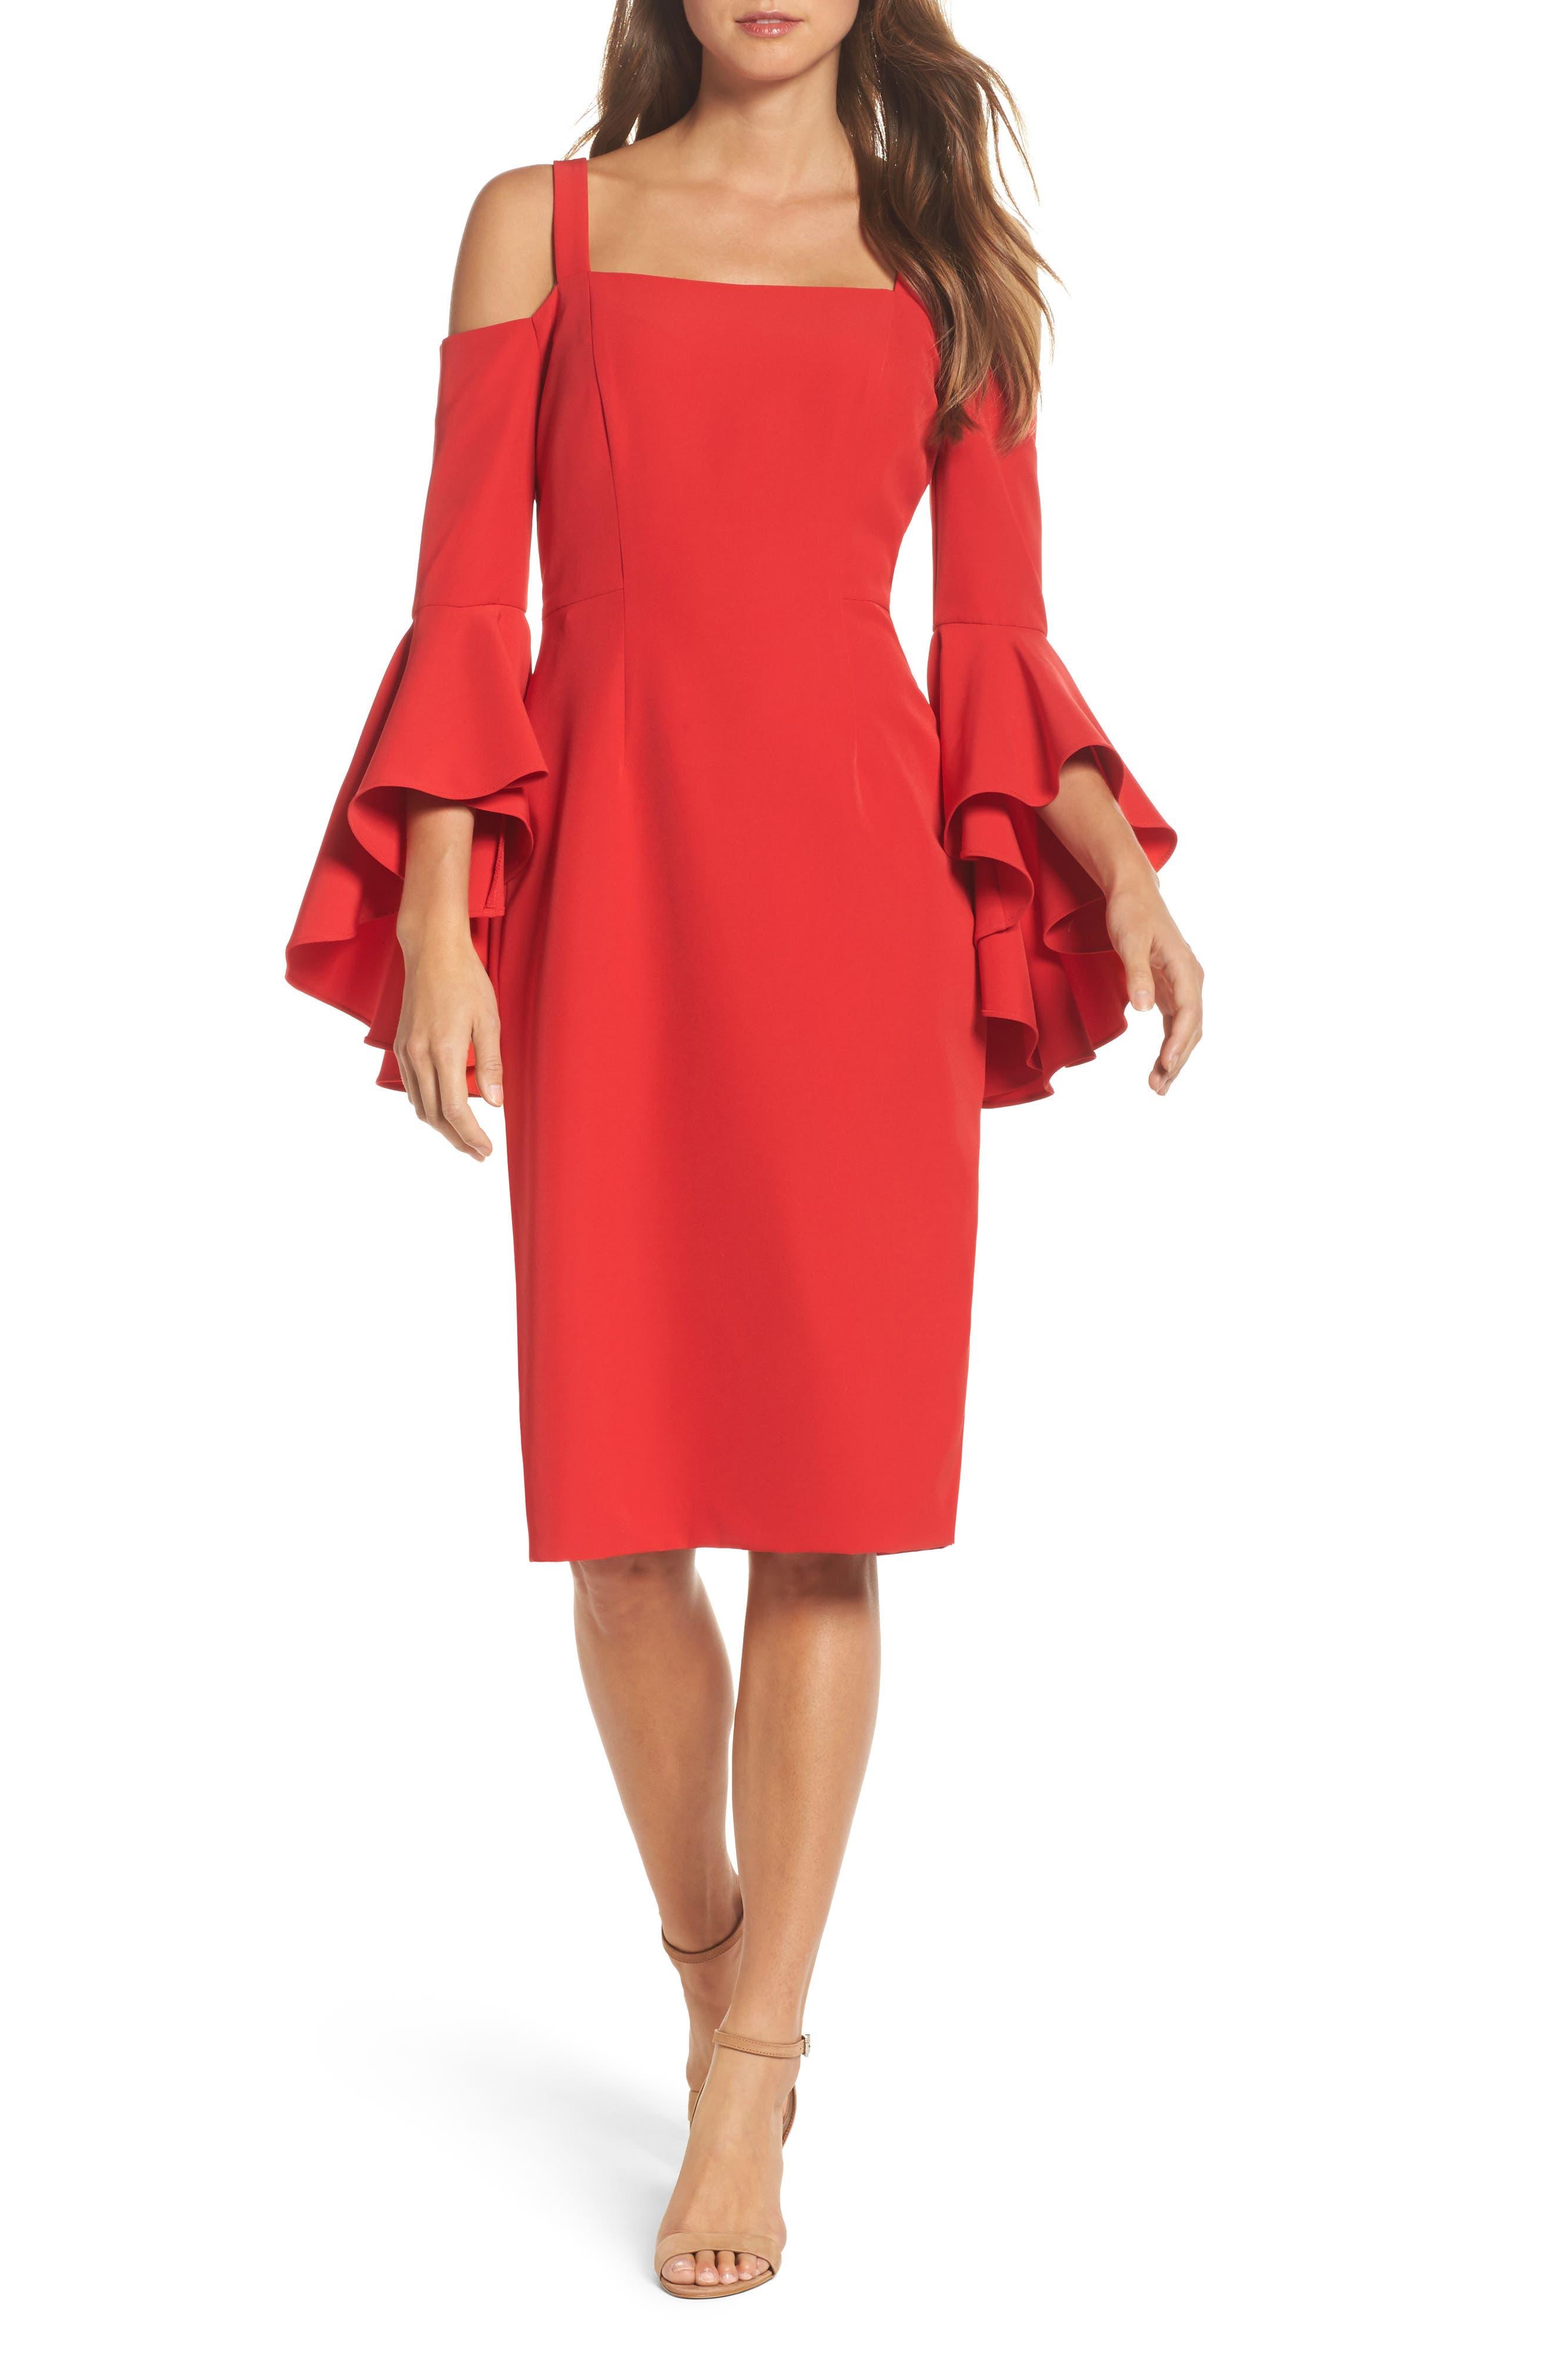 Alternate Image 1 Selected - Maggy London Cold Shoulder Crepe Sheath Dress